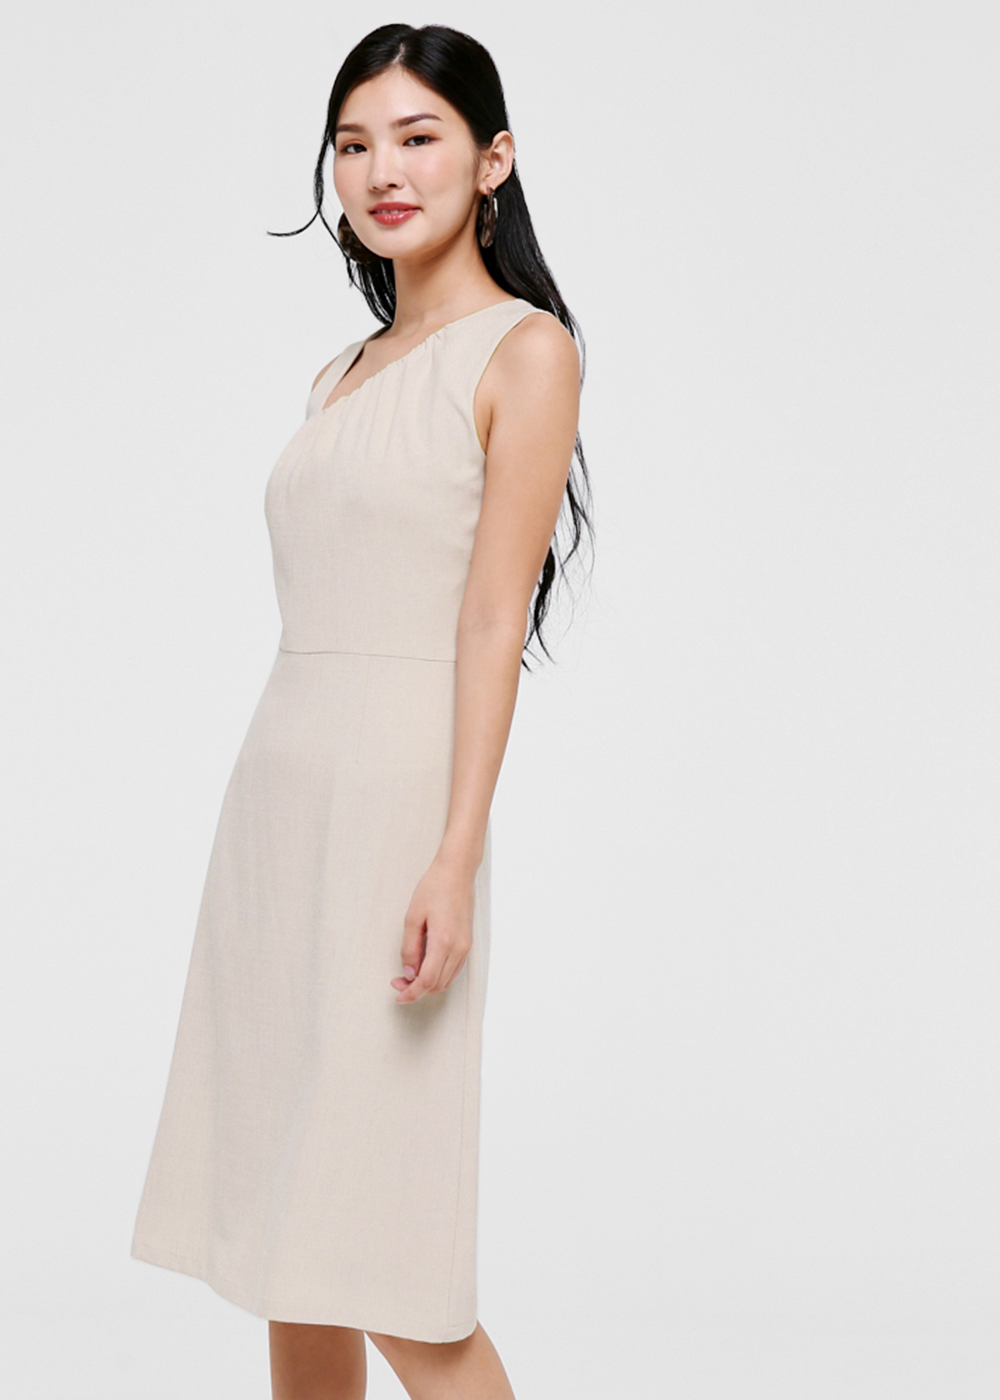 Loralei Asymmetrical Neckline Midi Dress